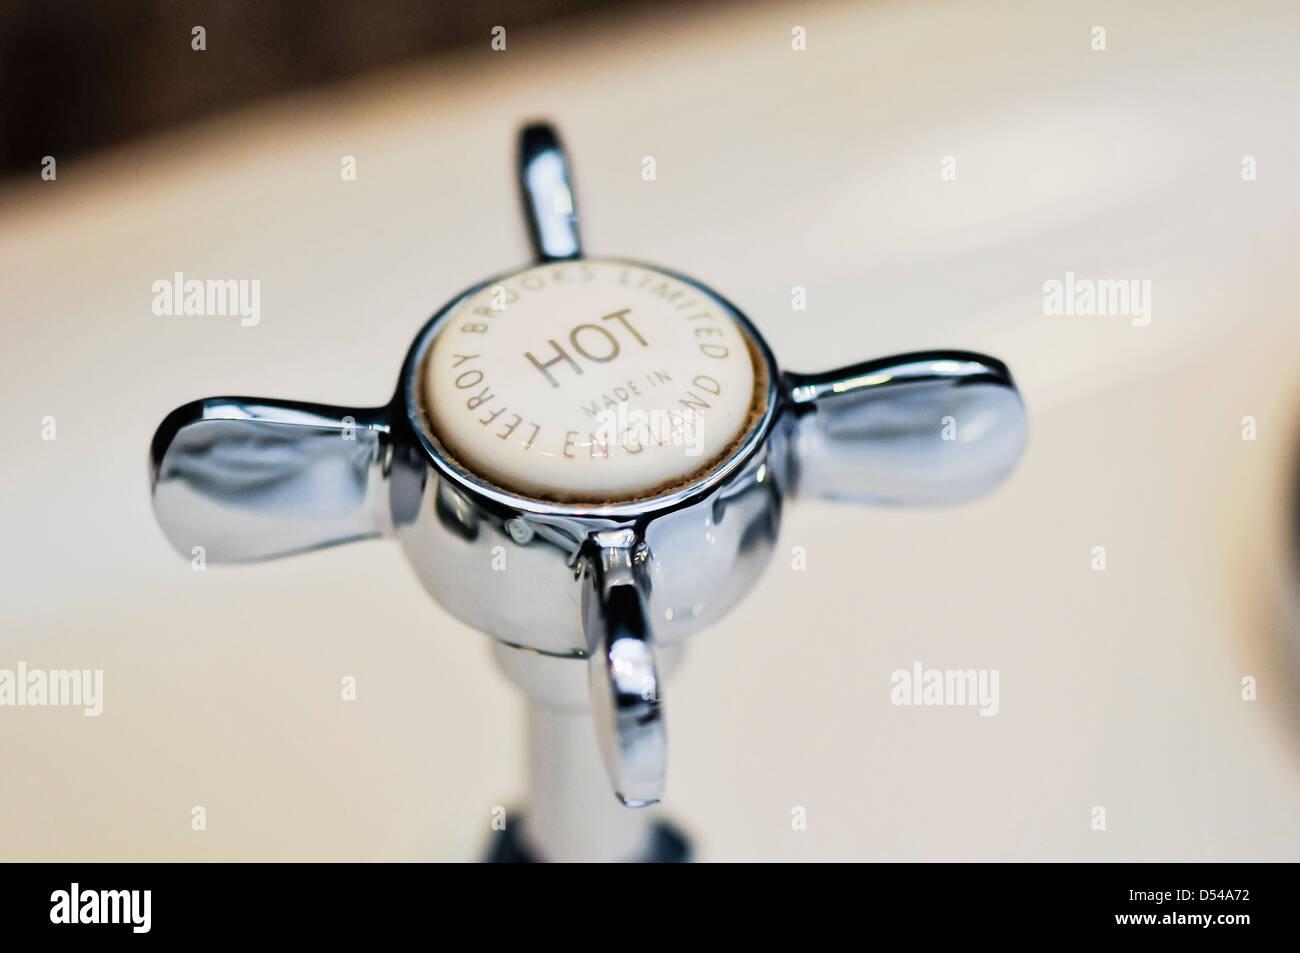 Lefroy Brooks La Chapelle hot tap fitting - Stock Image